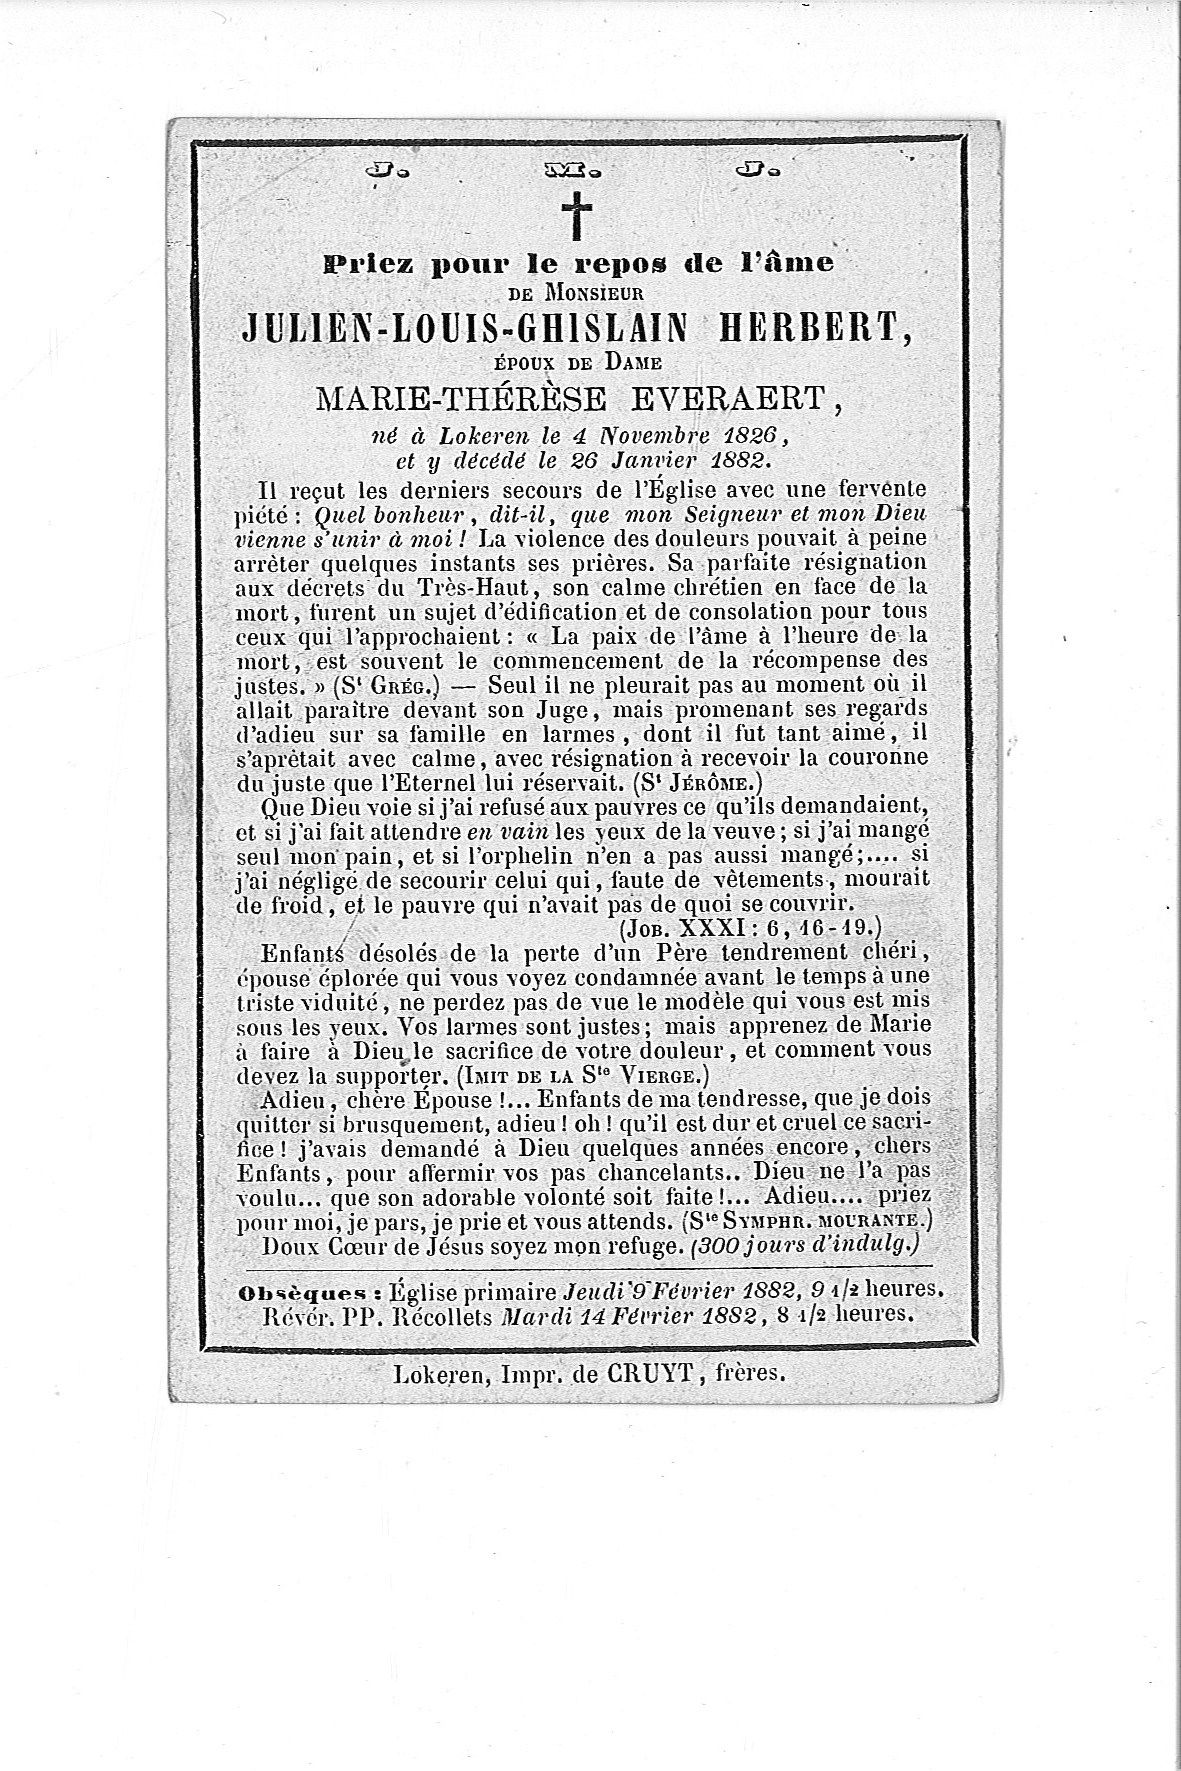 julien-louis-ghislain(1882)20090427112512_00055.jpg